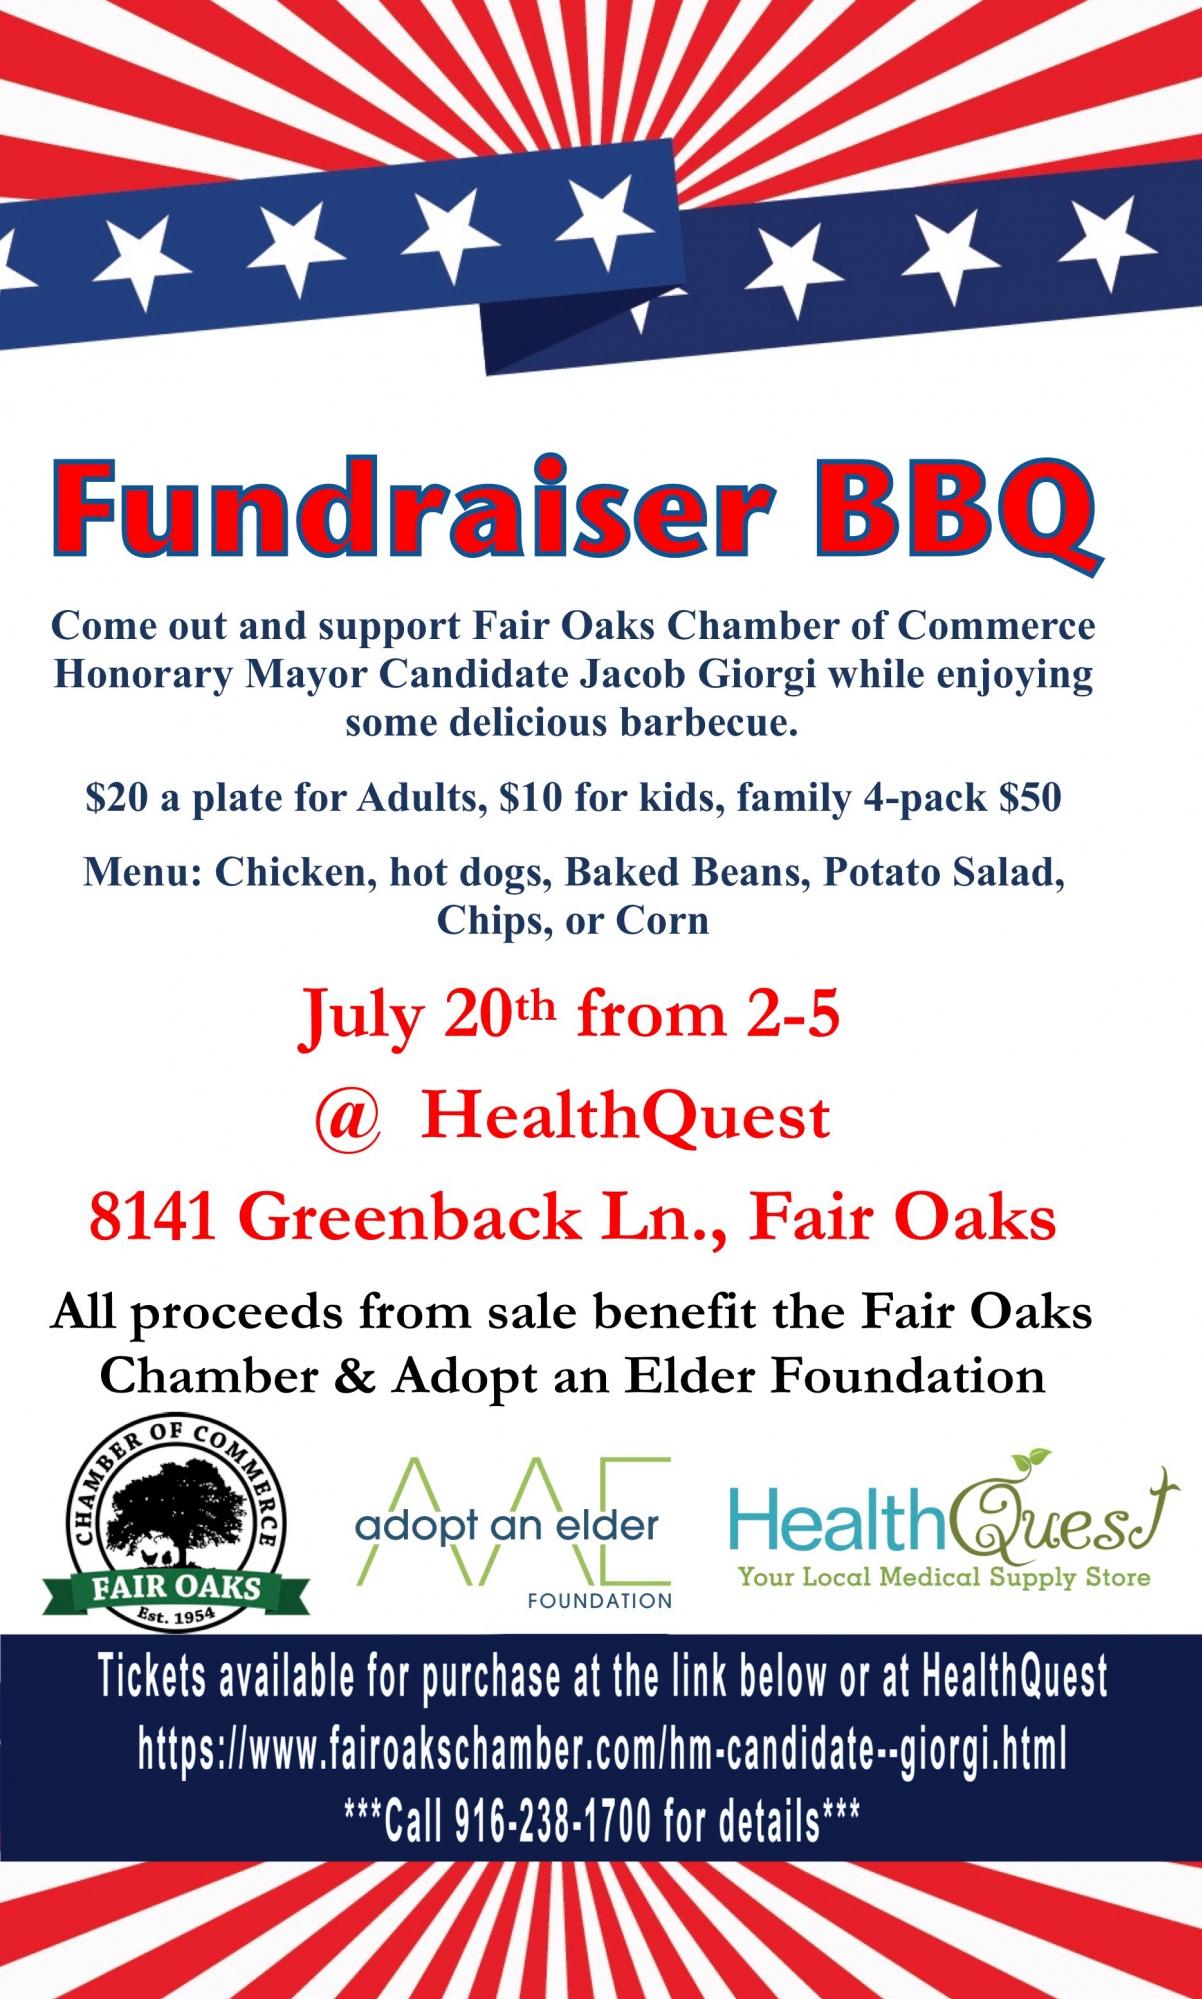 Fair Oaks Community Events - FAIR OAKS CHAMBER OF COMMERCE